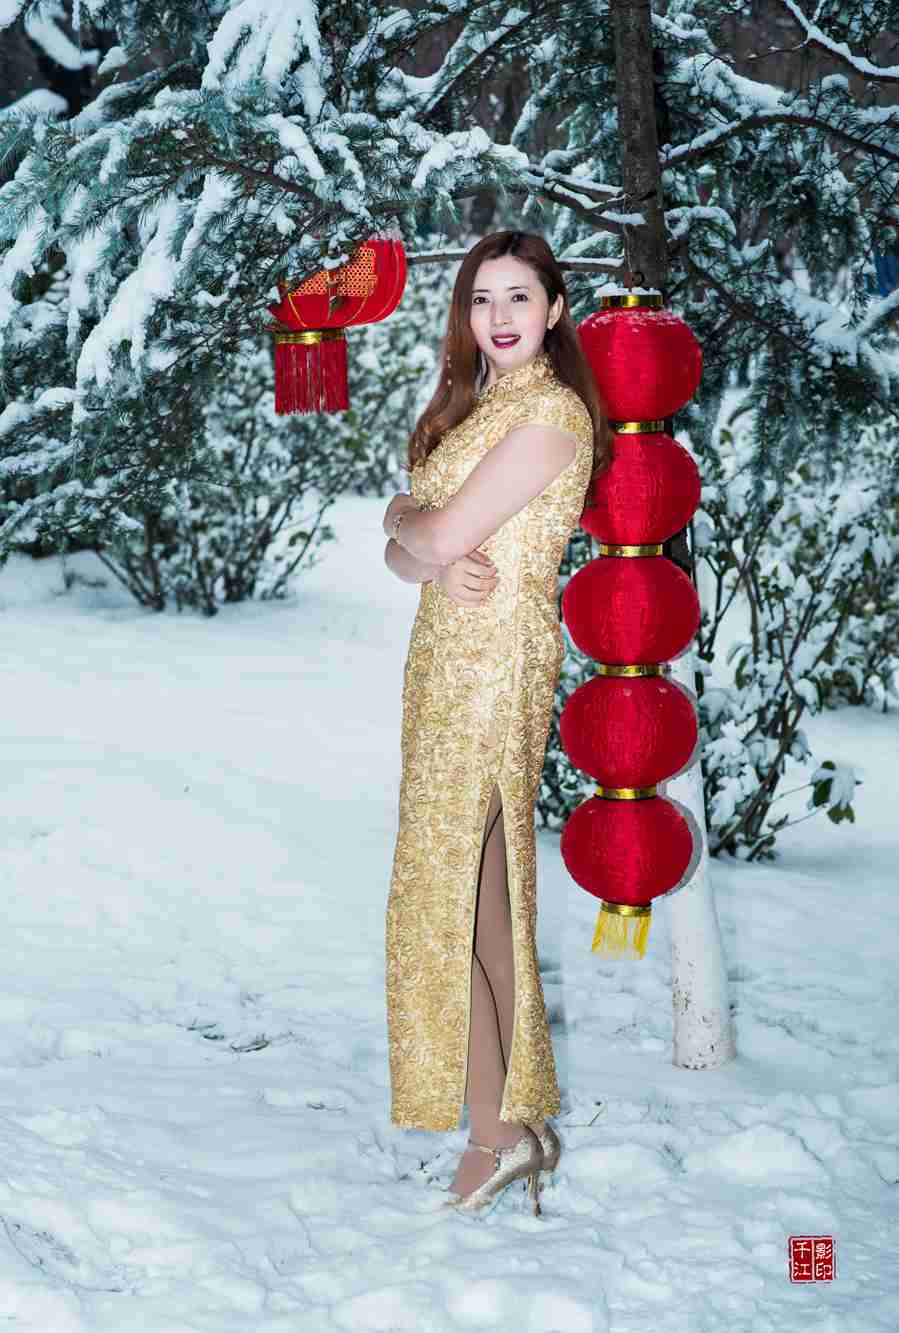 腊梅白雪与旗袍美女争艳